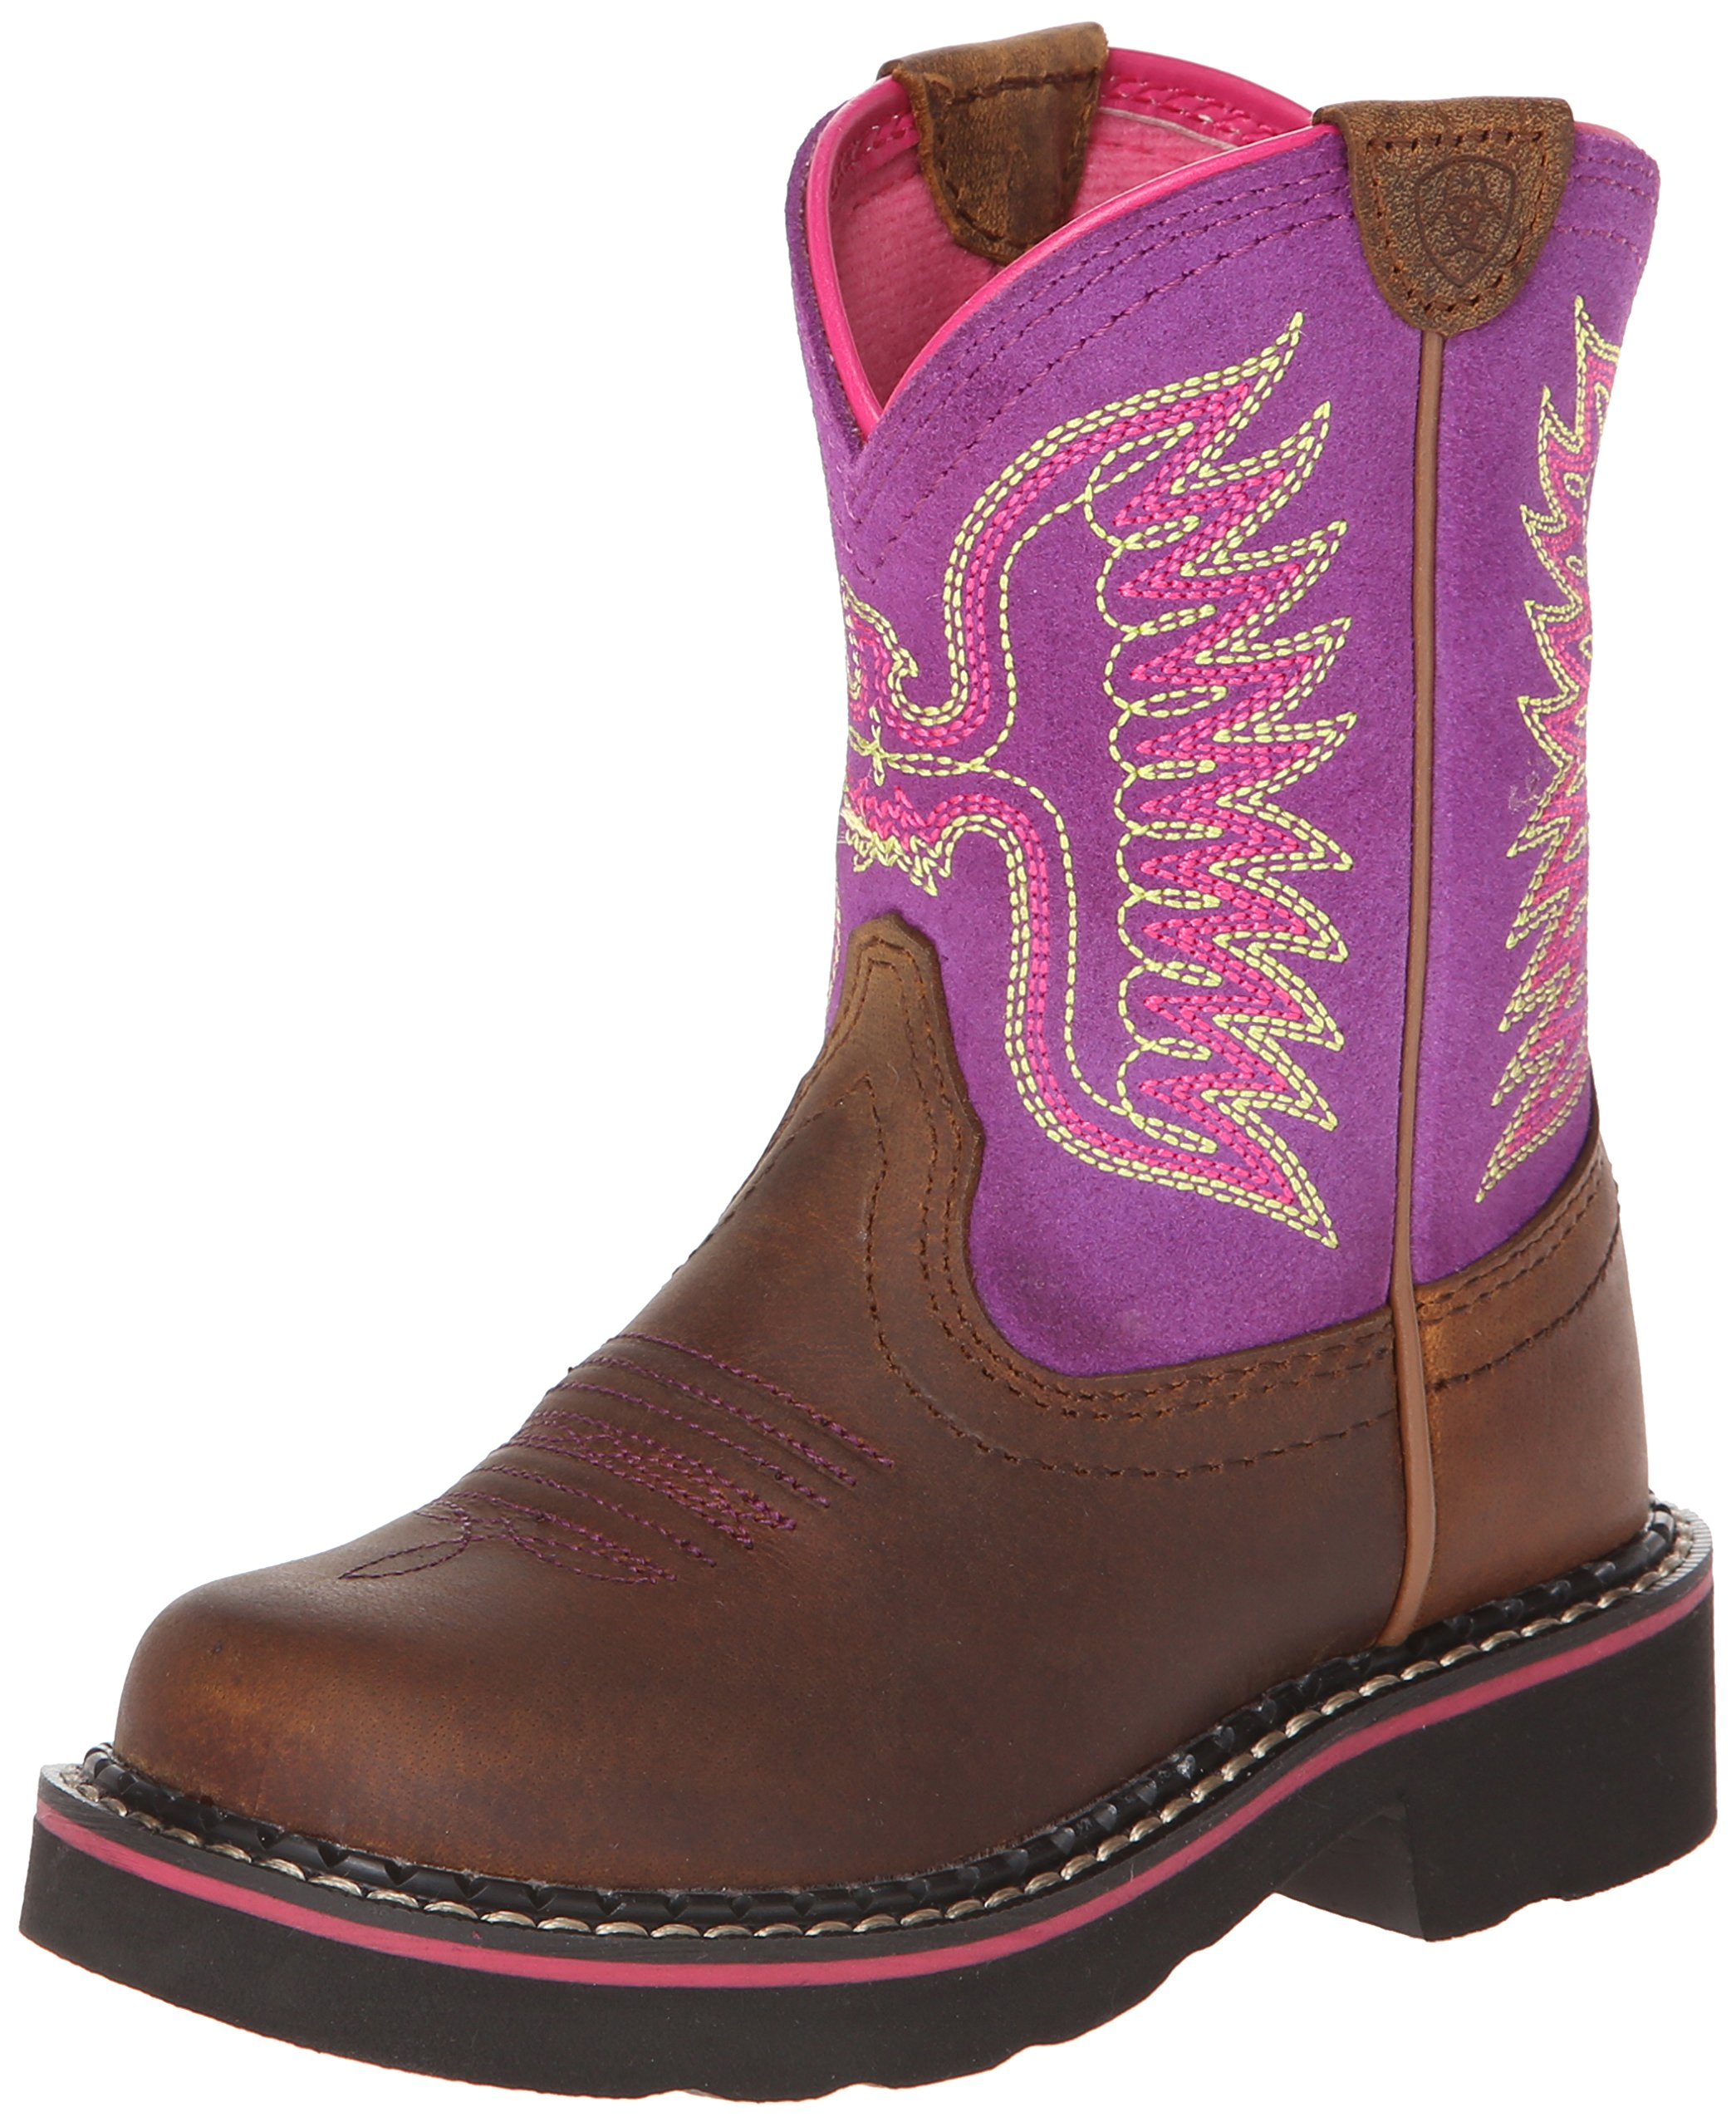 Kids' Fatbaby Thunderbird Western Cowboy Boot, Powder Brown/Amethyst, 12.5 M US Little Kid